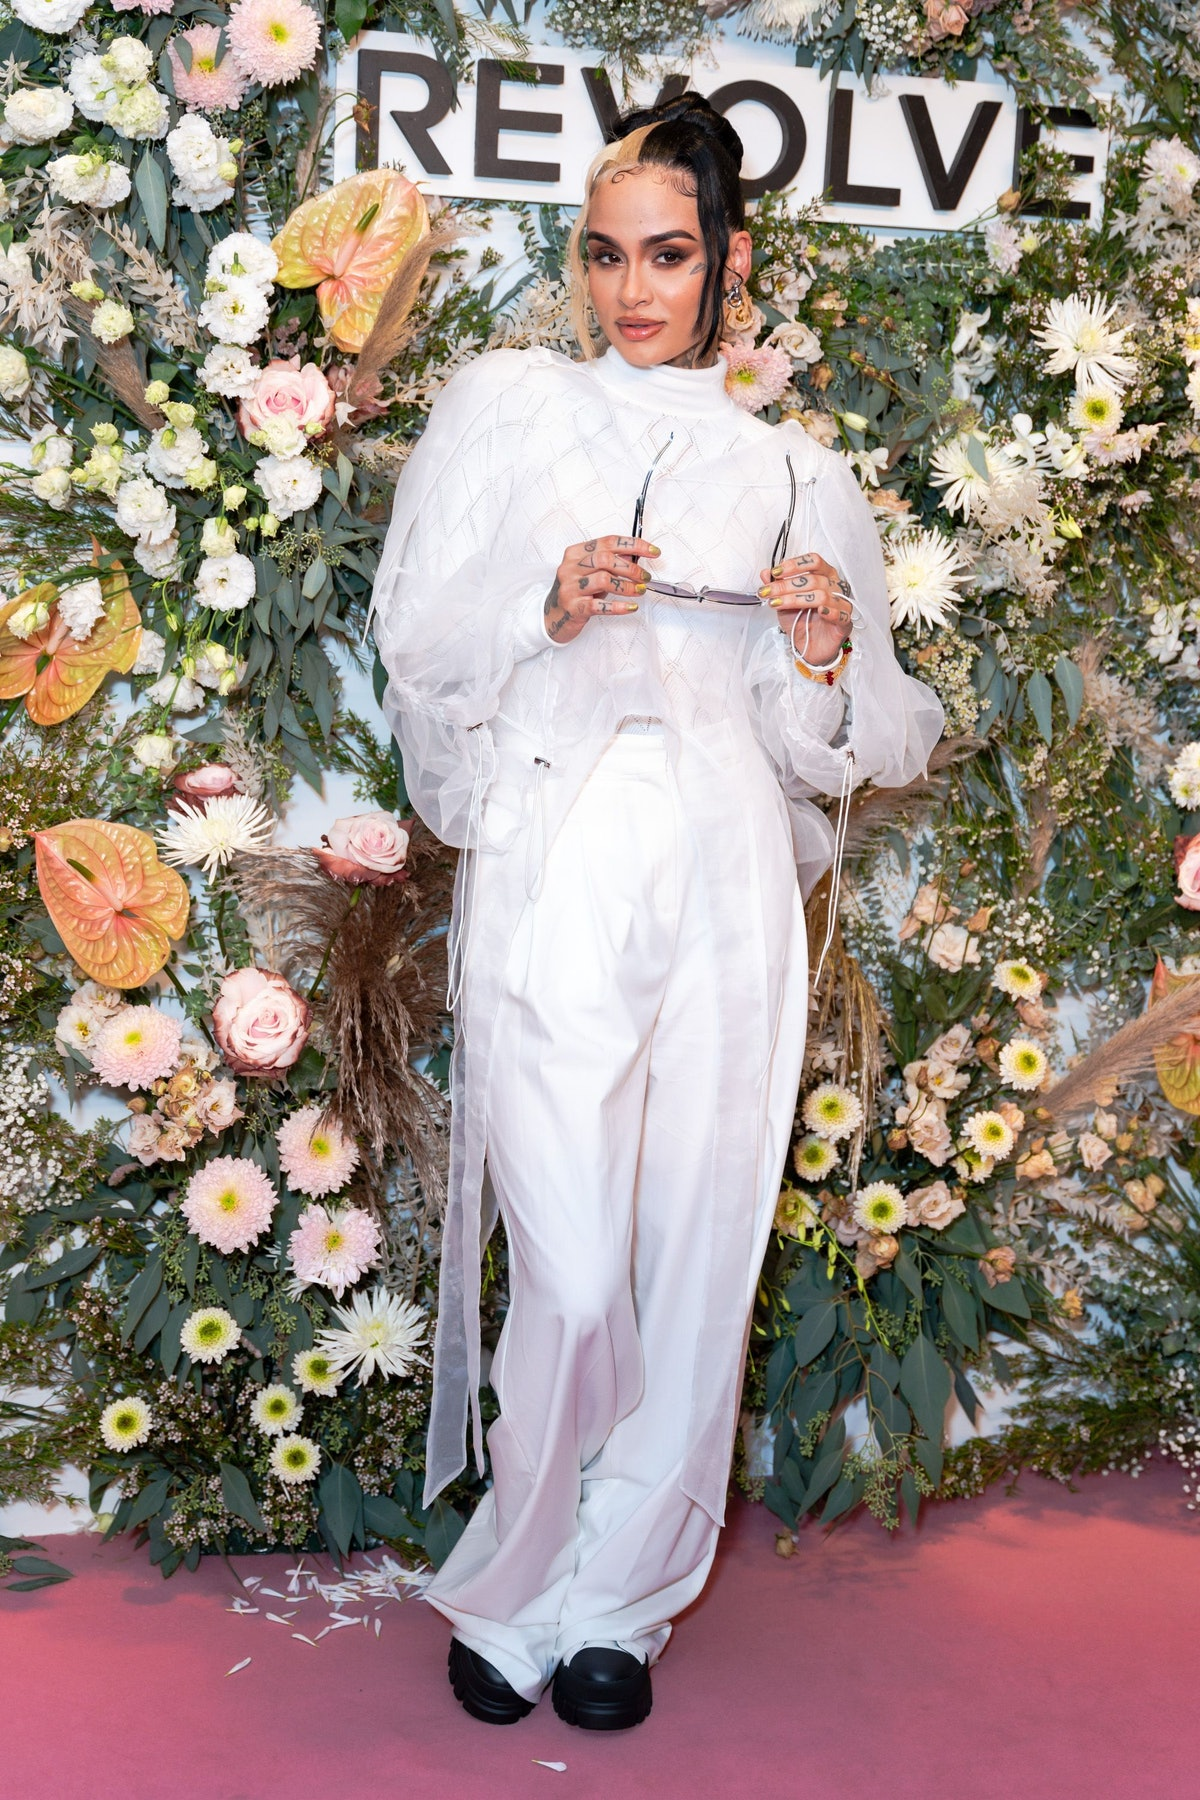 Kehlani attends the Revolve Gallery at Hudson Yards on September 09, 2021 in New York City.